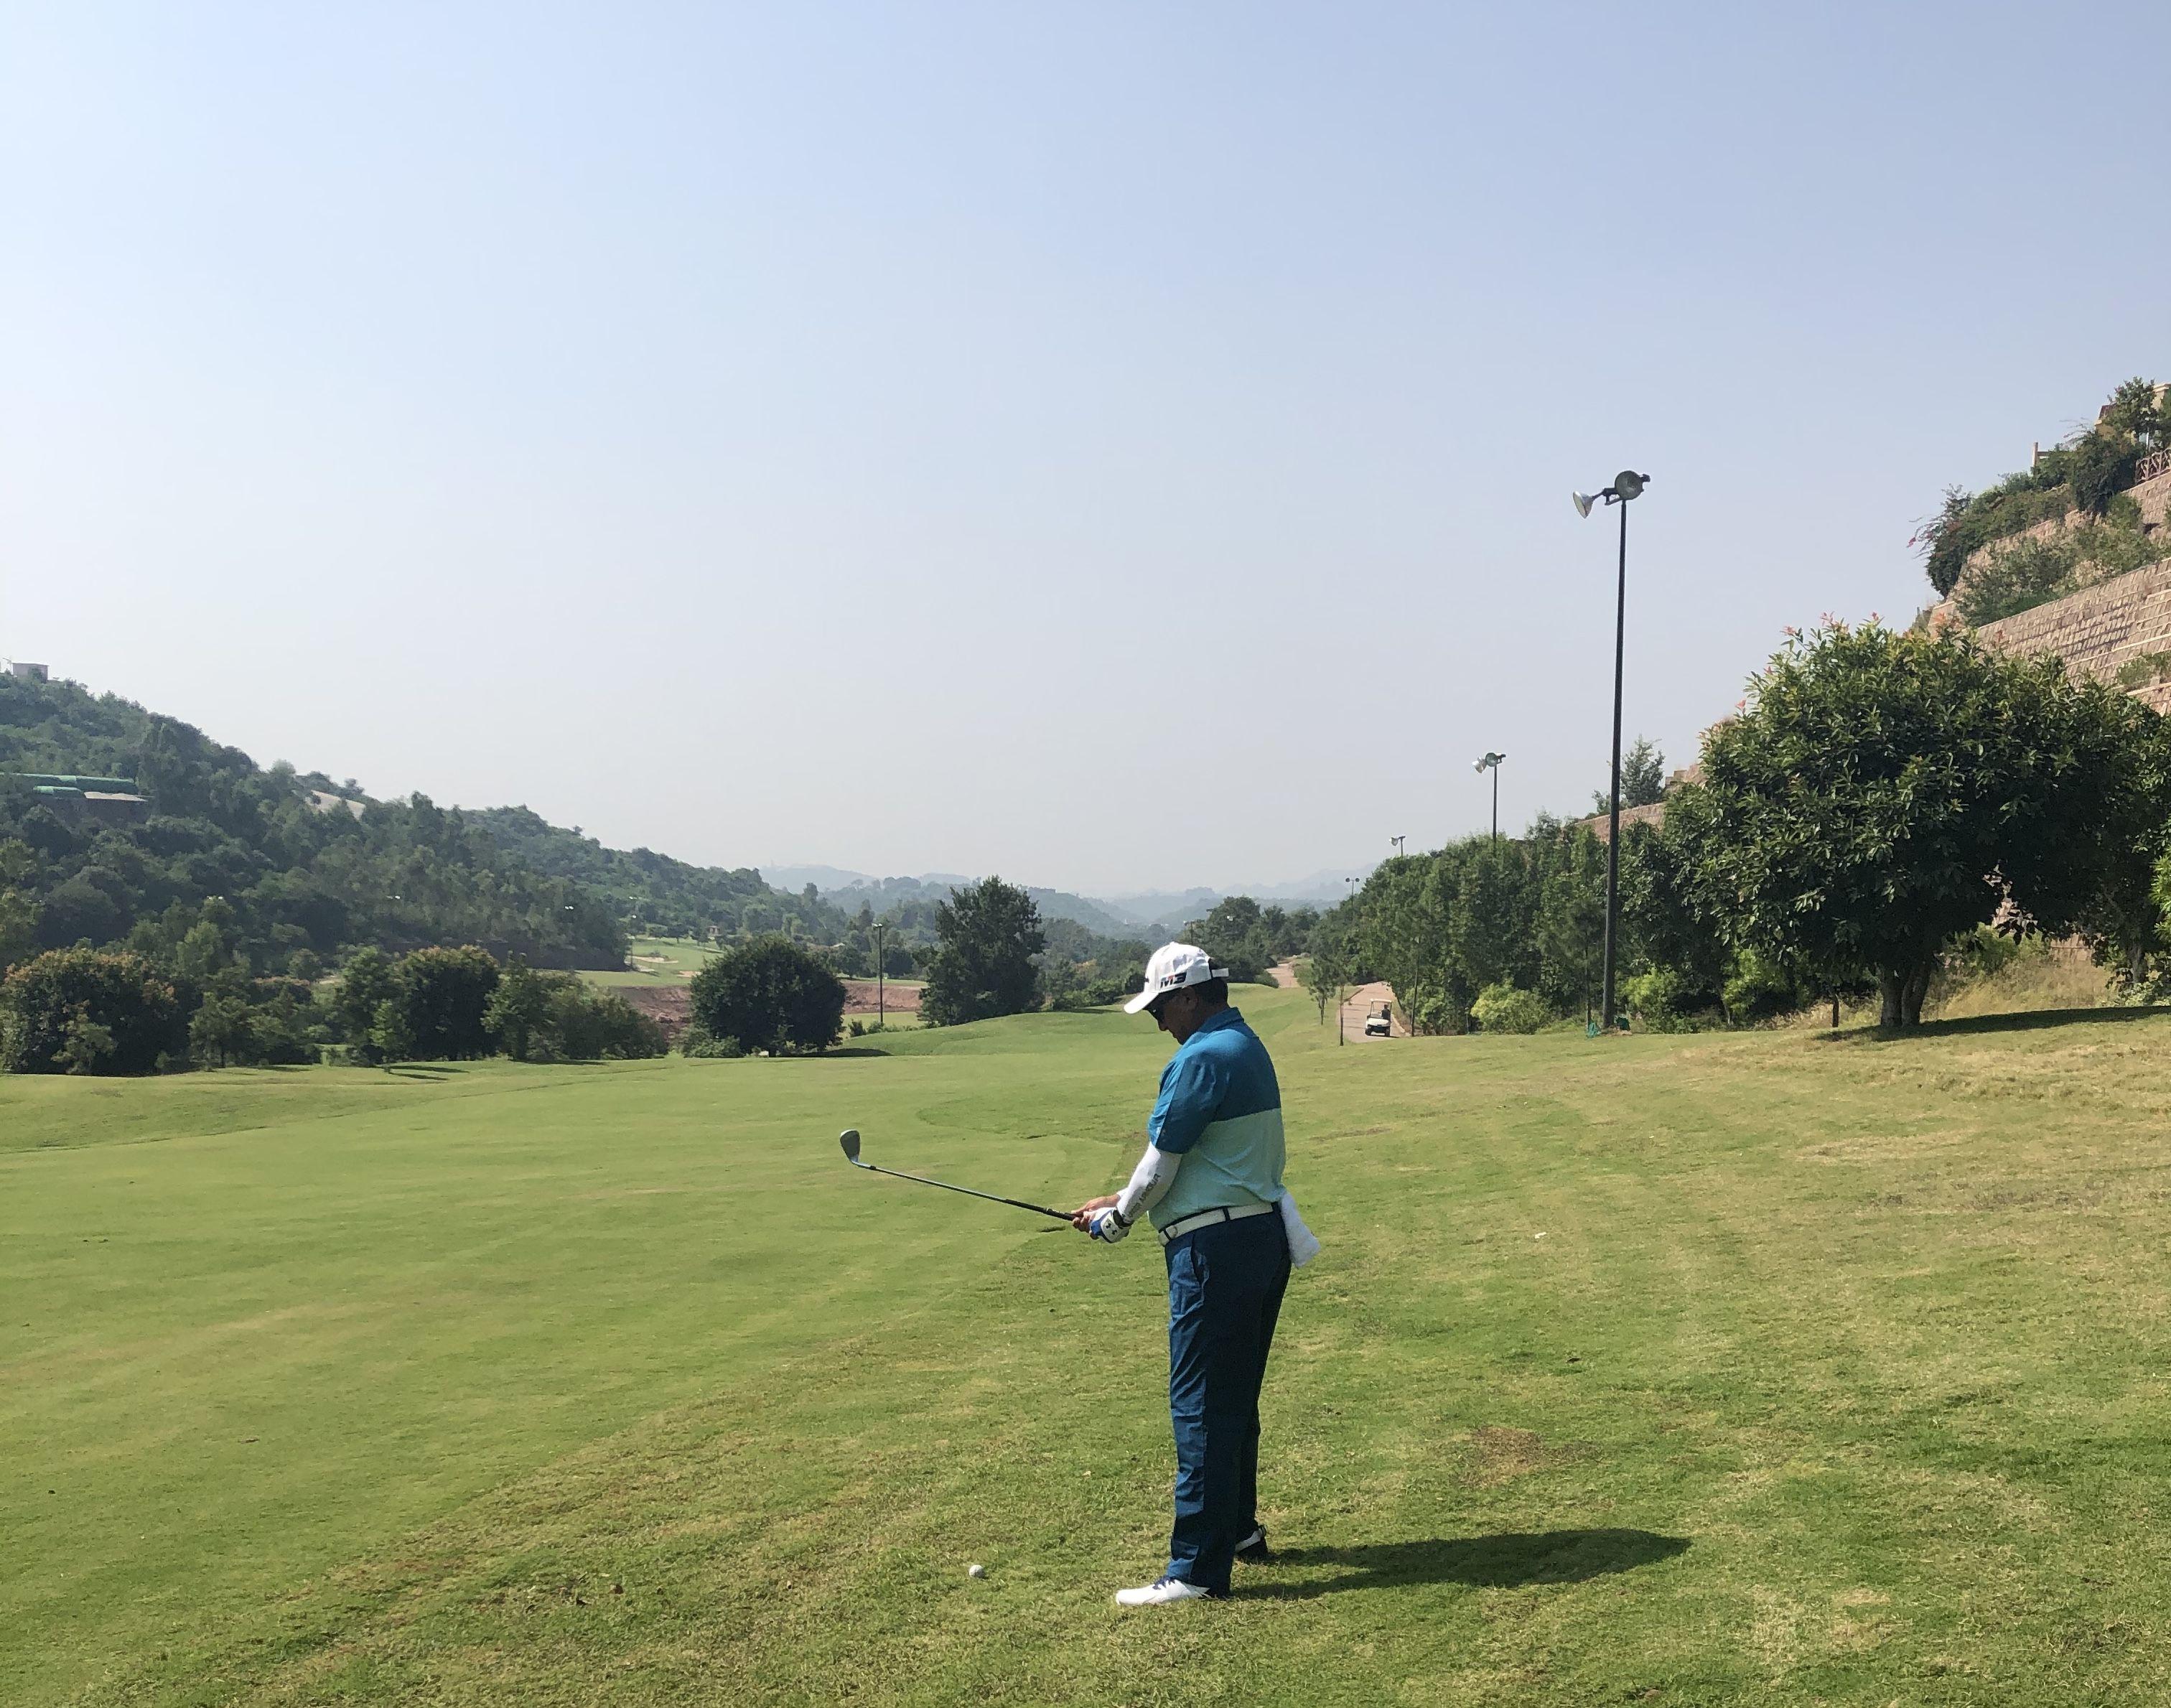 At pine golf club Islamabad | Pine valley golf, Golf clubs ...